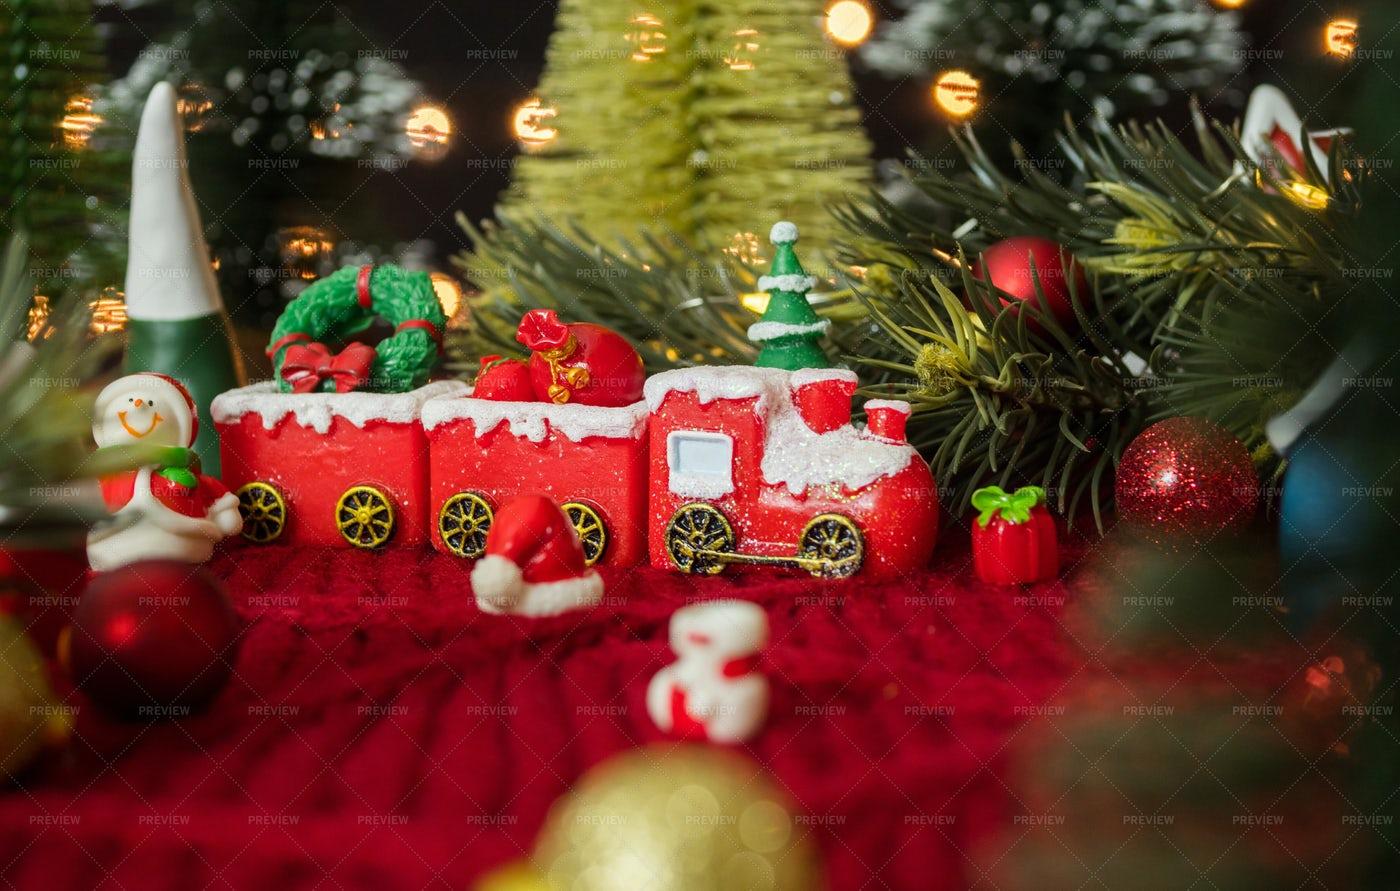 Ornament Christmas Train: Stock Photos